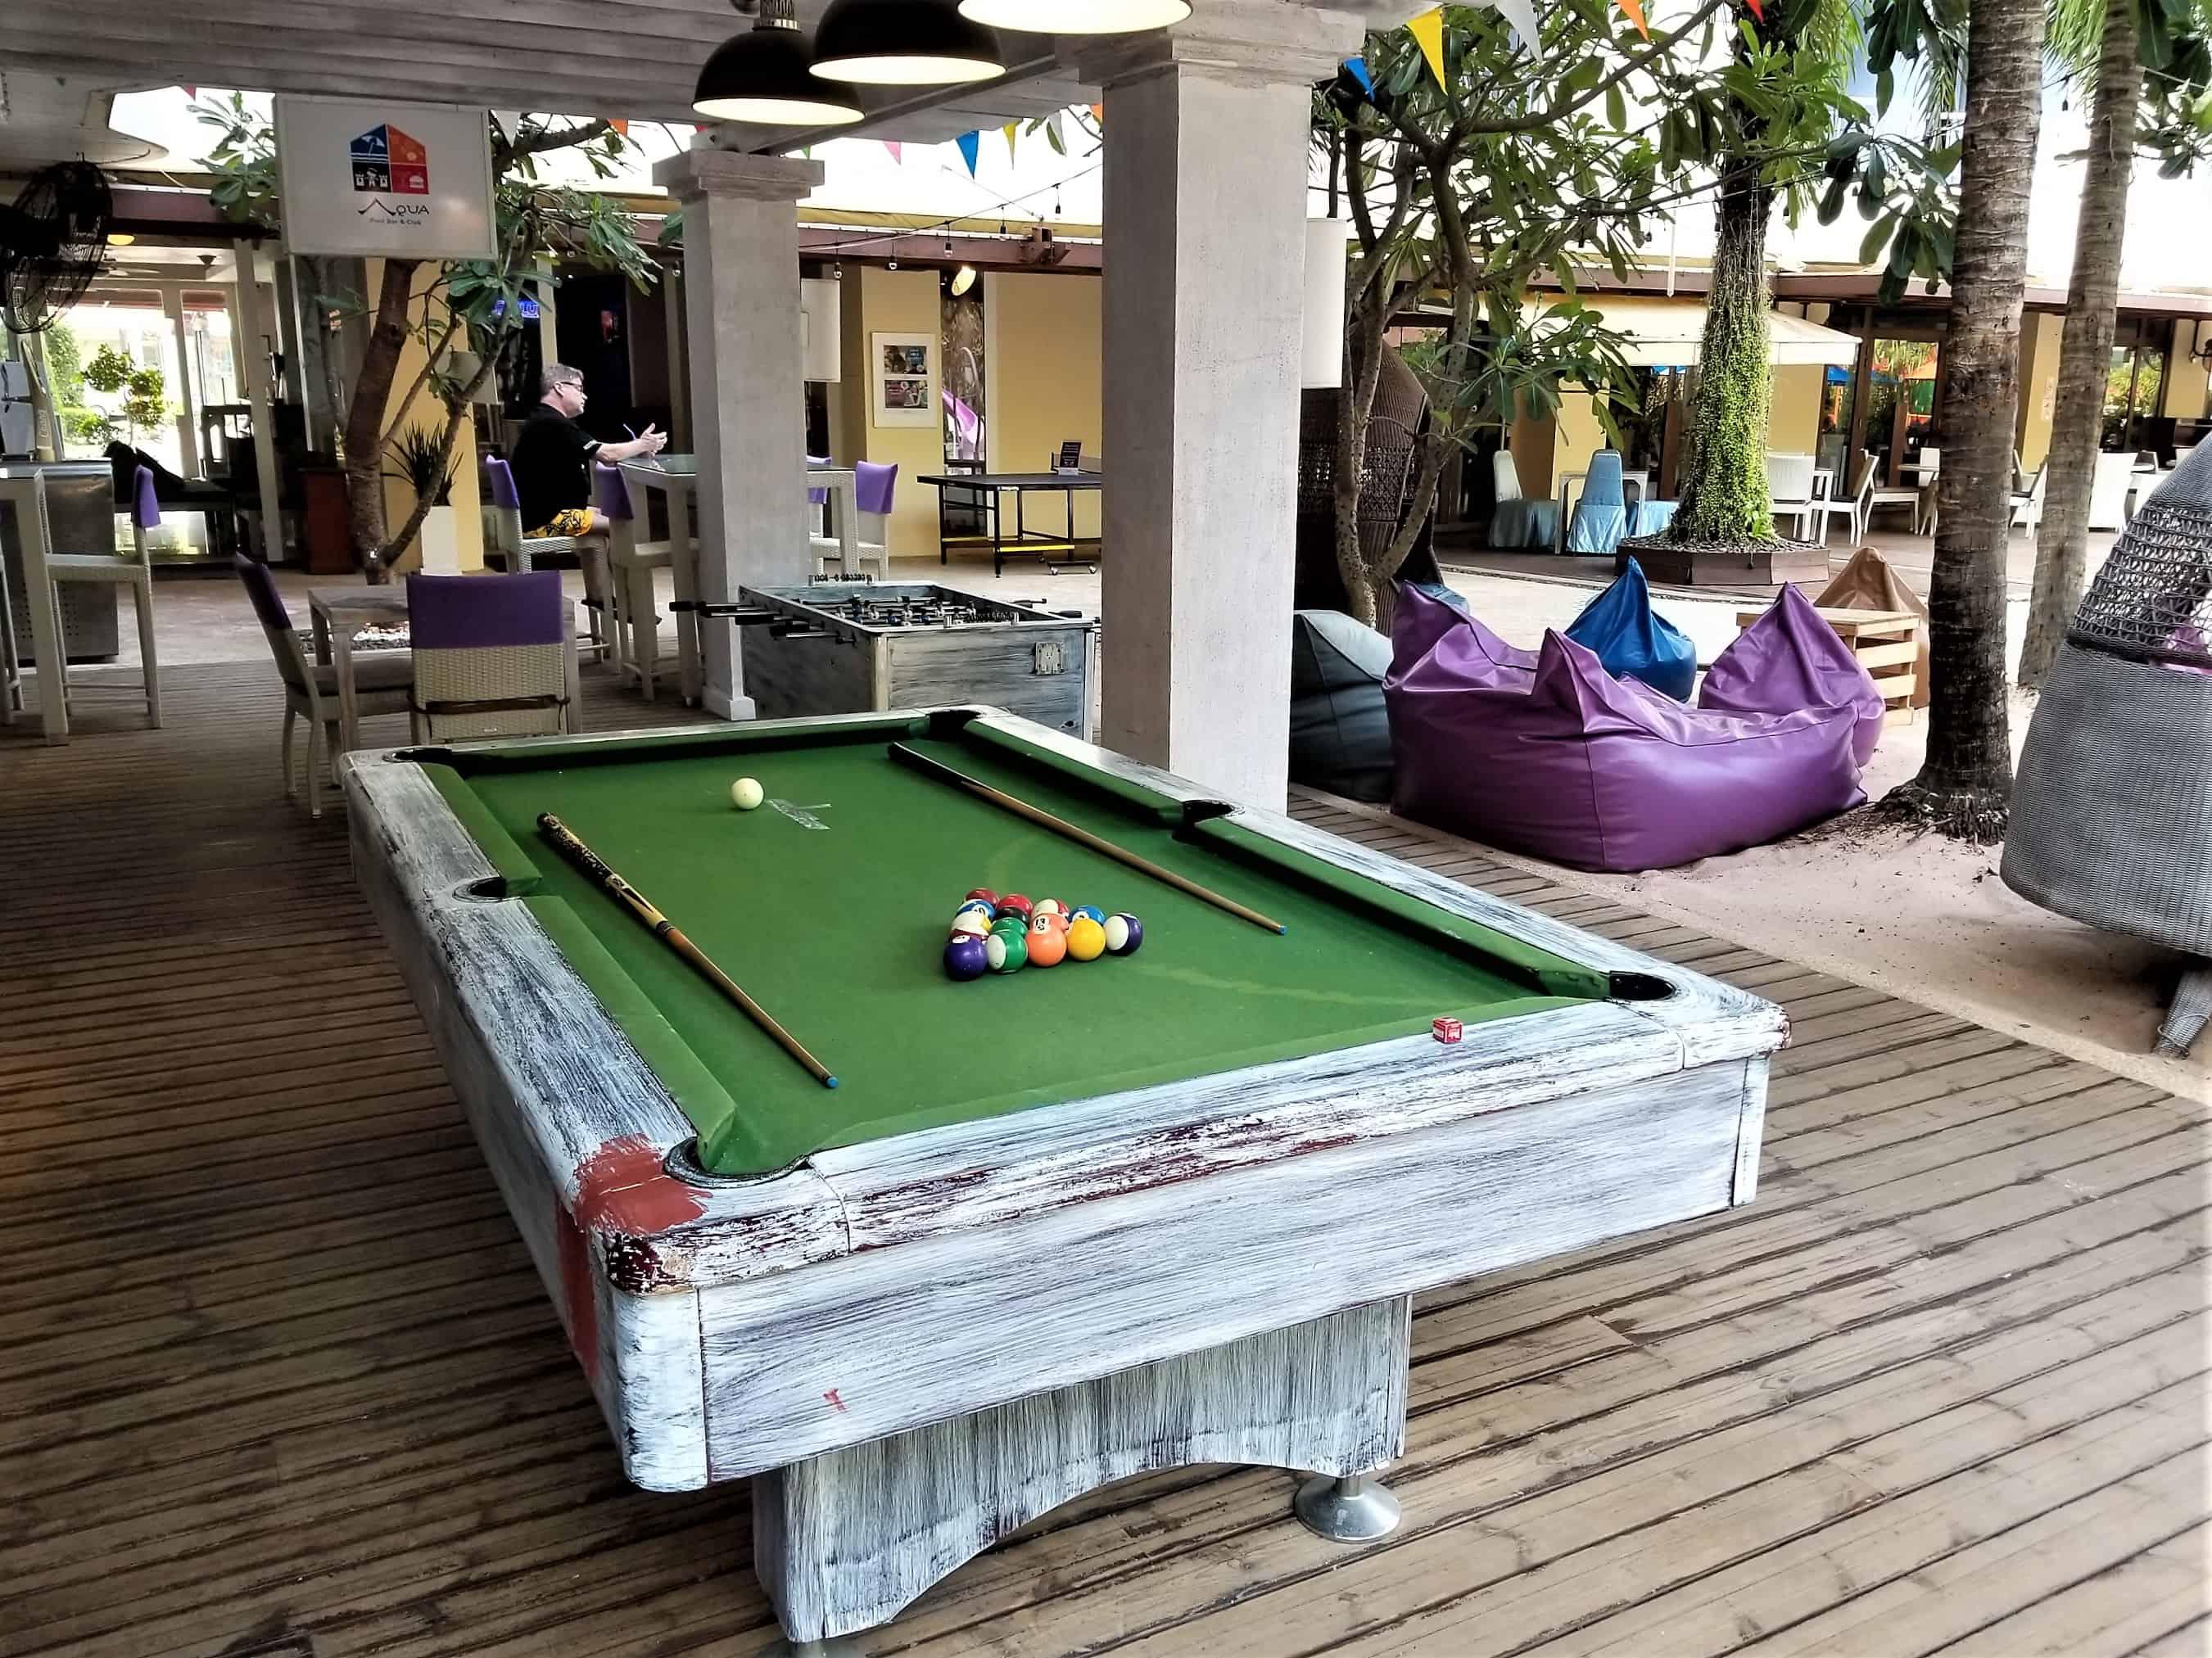 image-of-mercure-hotel-pattaya-aqua-pool-bar-and-club-pool-table